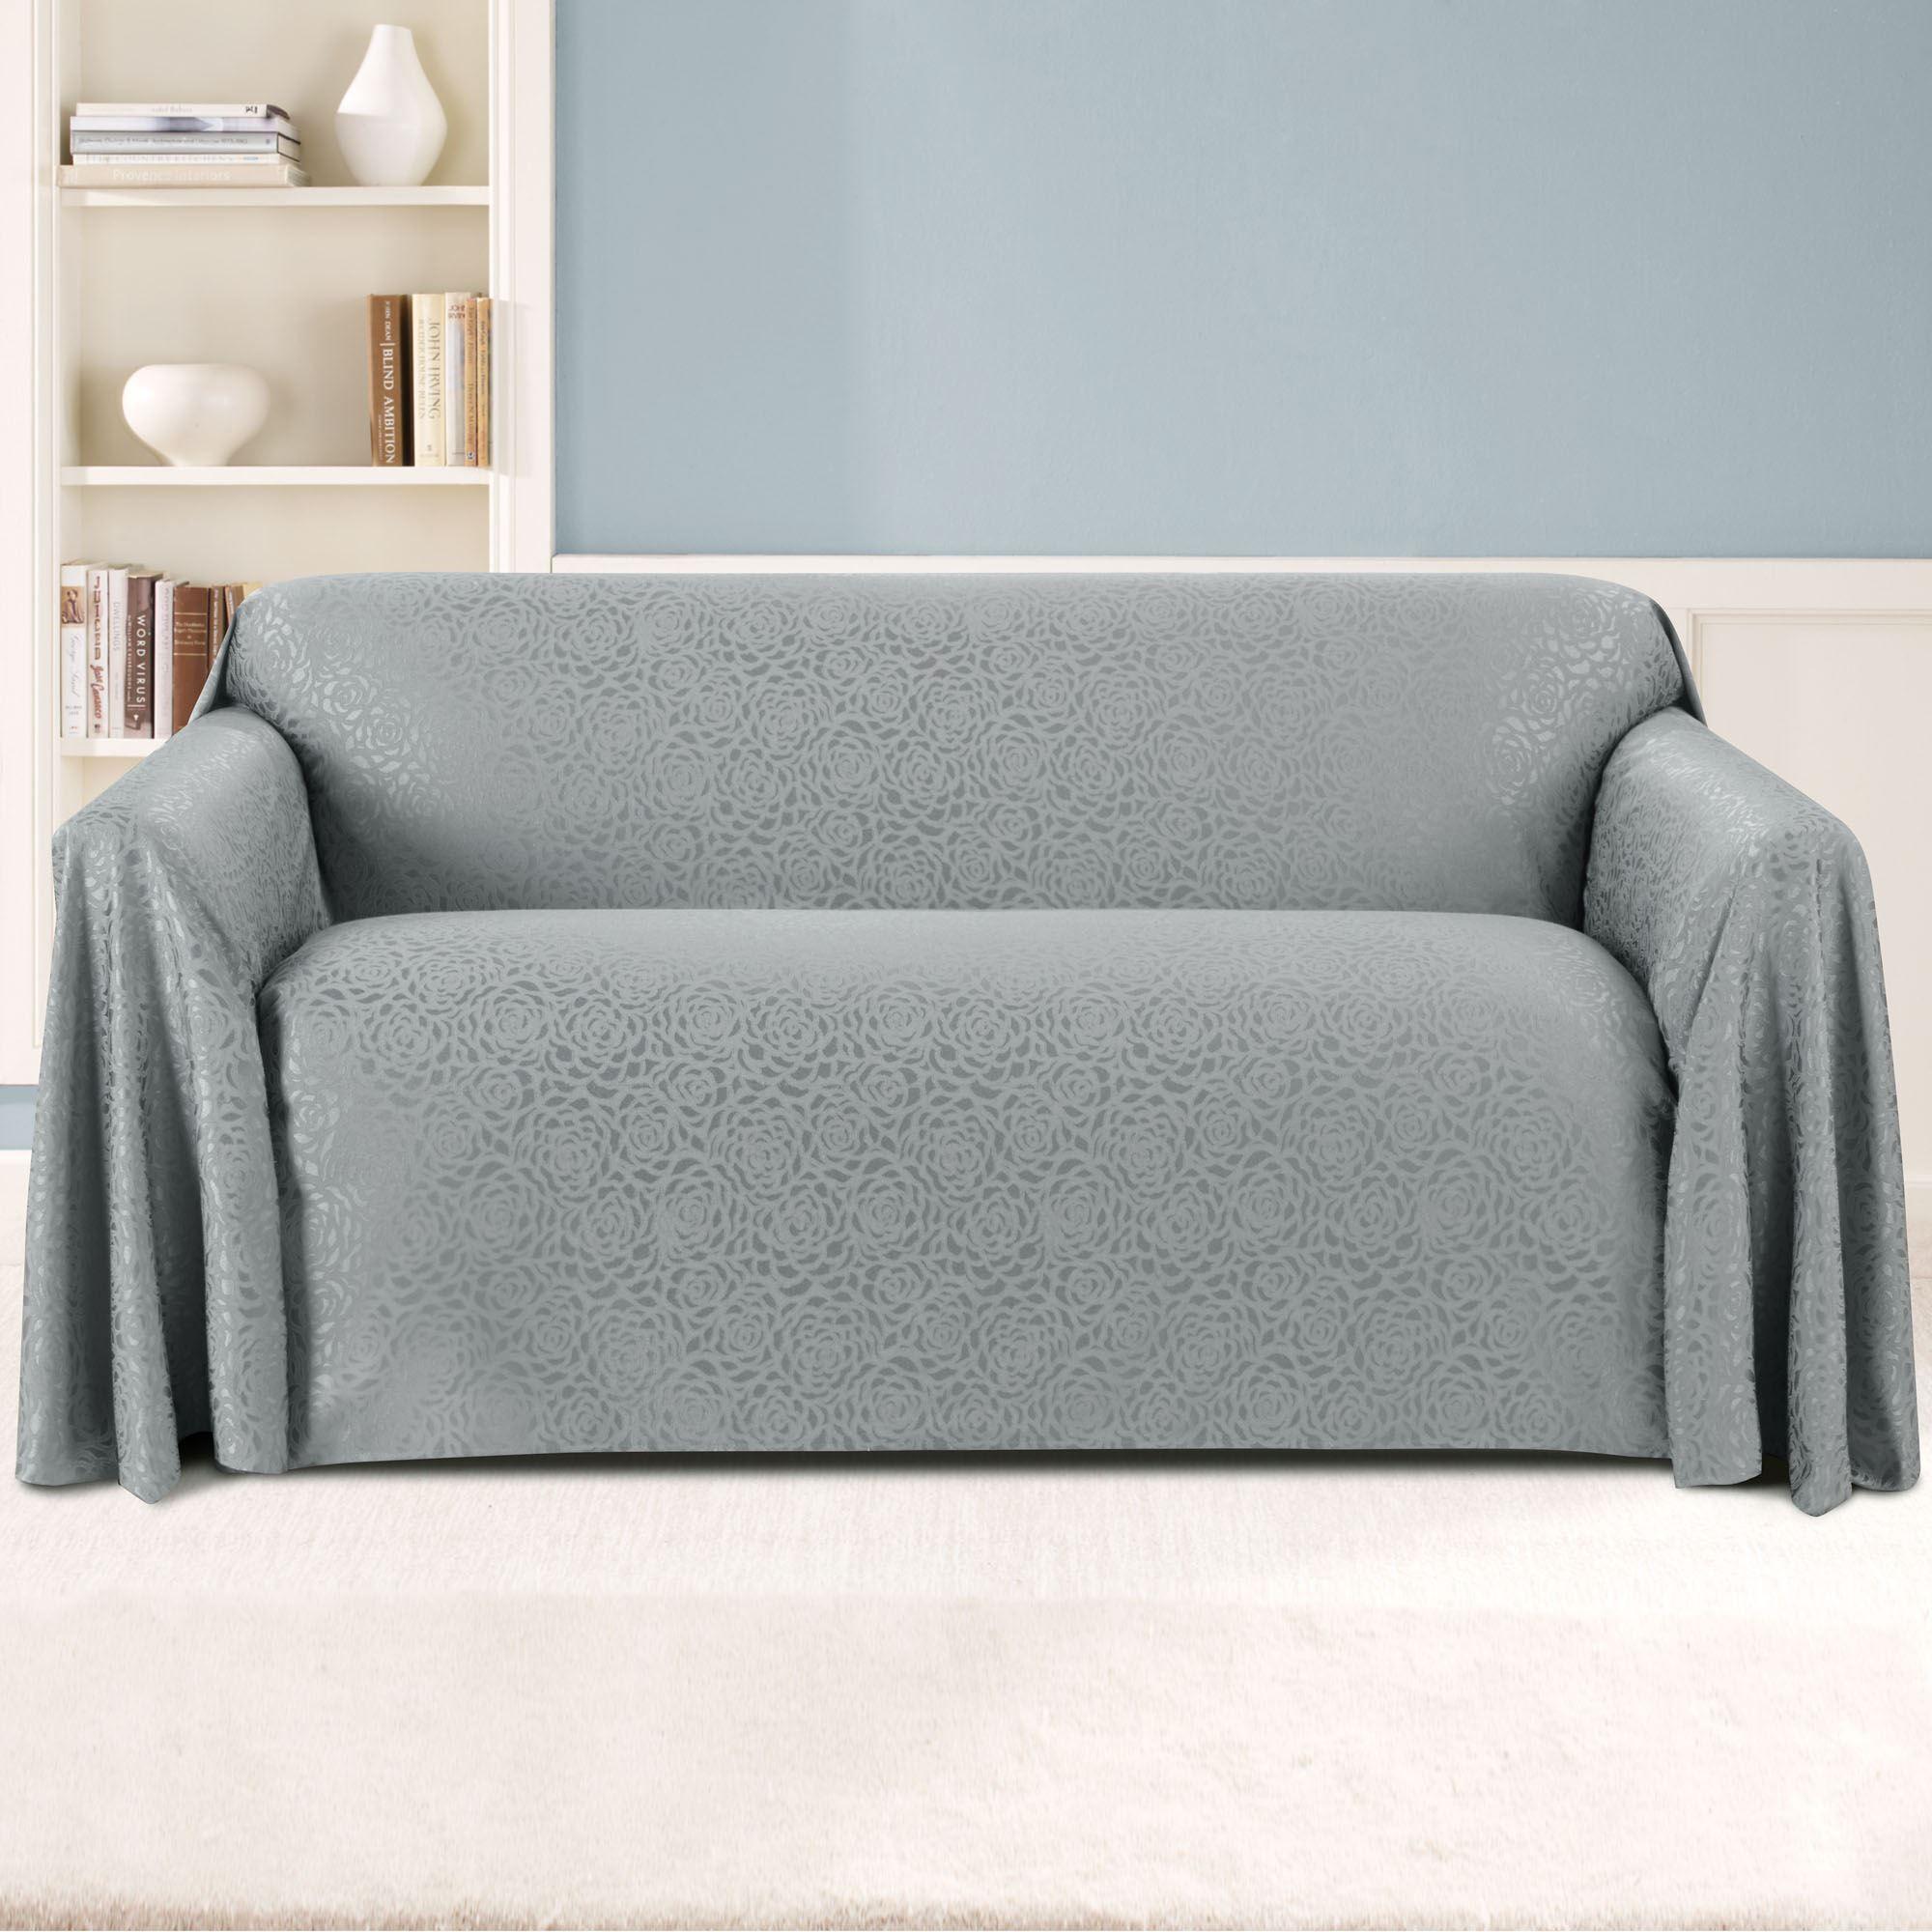 rose sofa slipcover corinthian reclining reviews rosanna jacquard drapable furniture covers